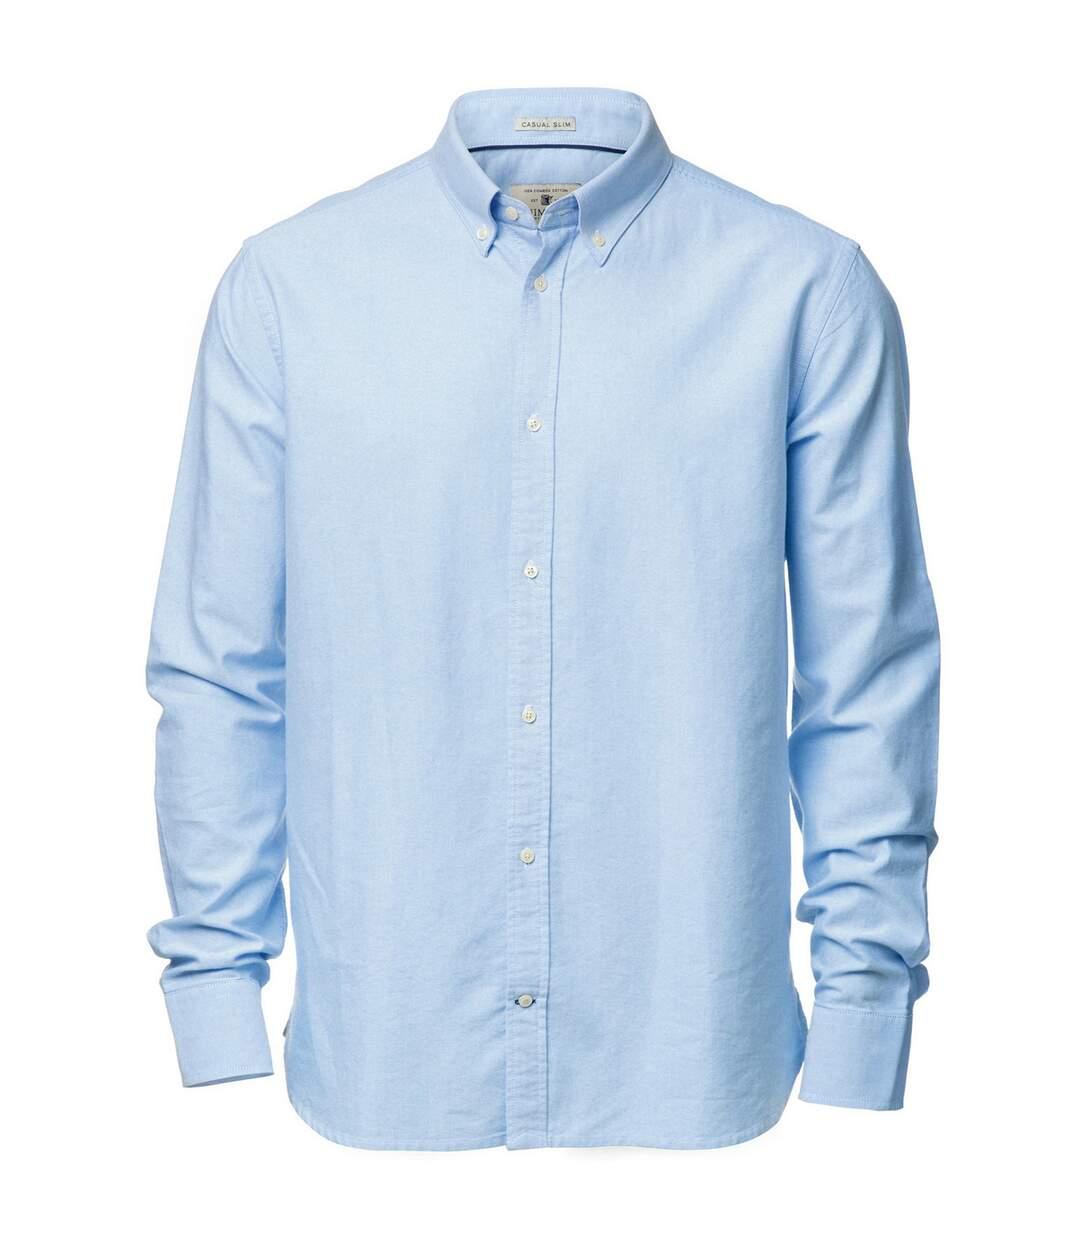 Nimbus Mens Rochester Oxford Long Sleeve Formal Shirt (Light Blue) - UTRW3633